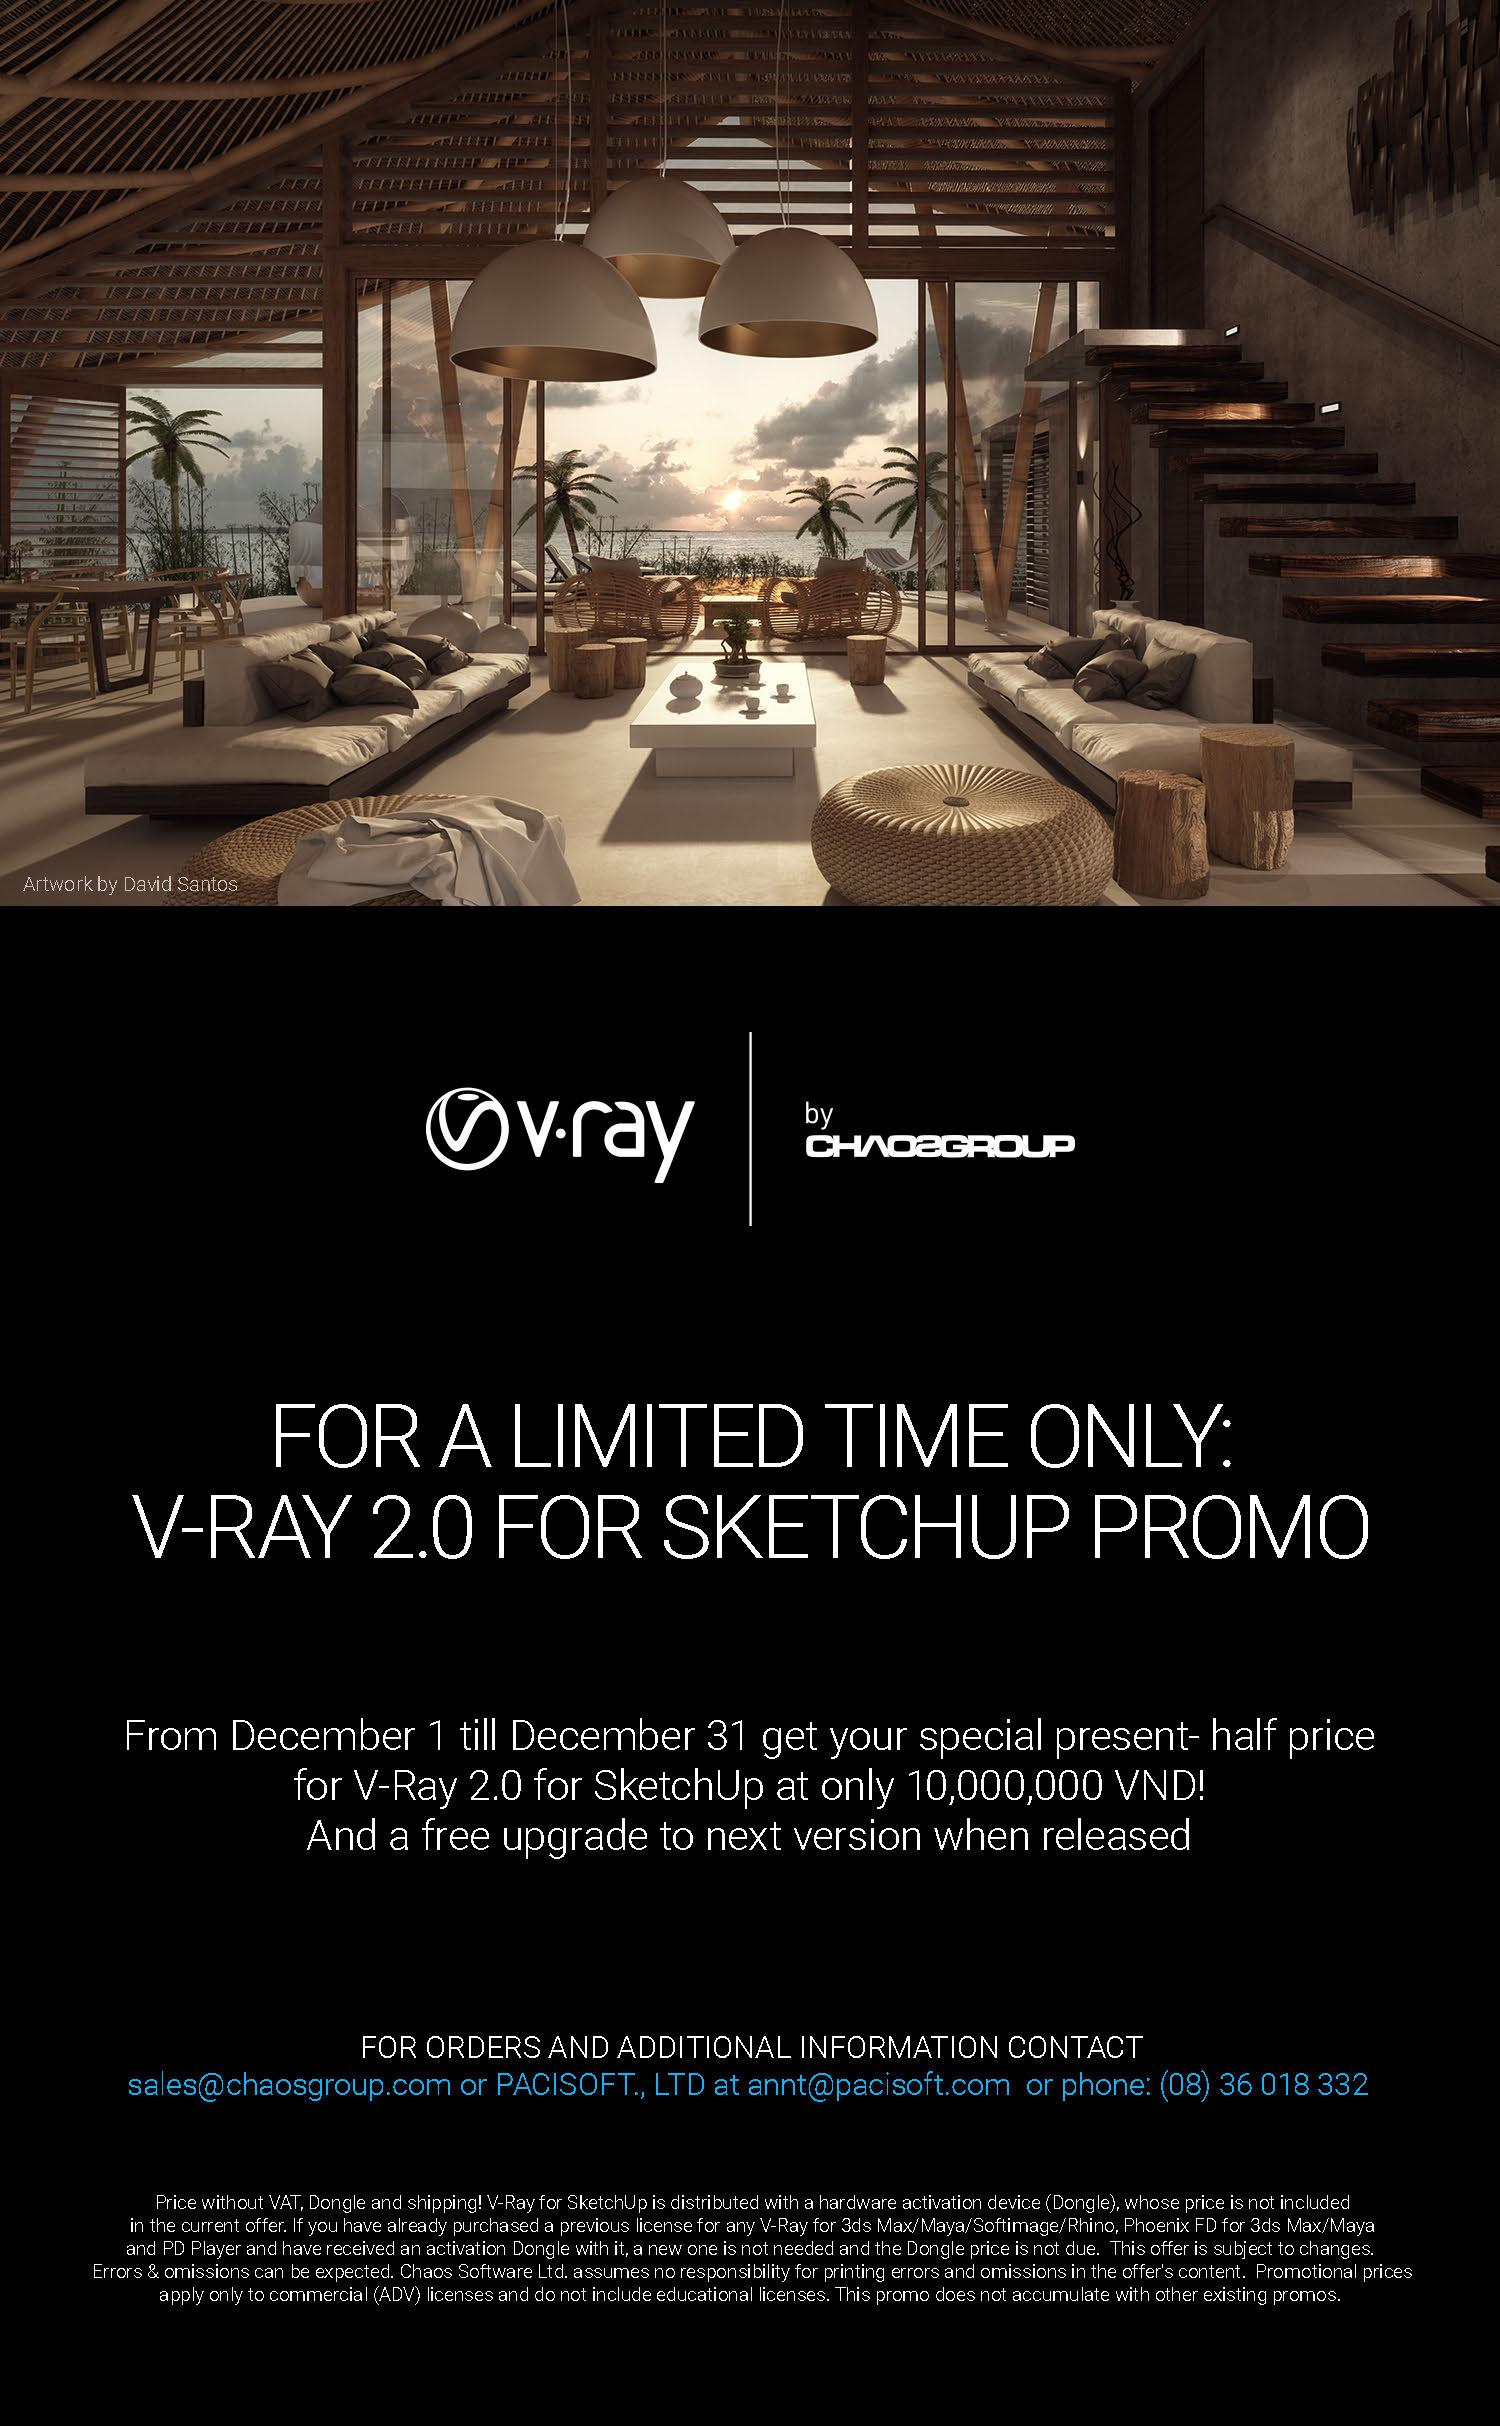 vietnam_v-ray_2-0_sketchup_promo